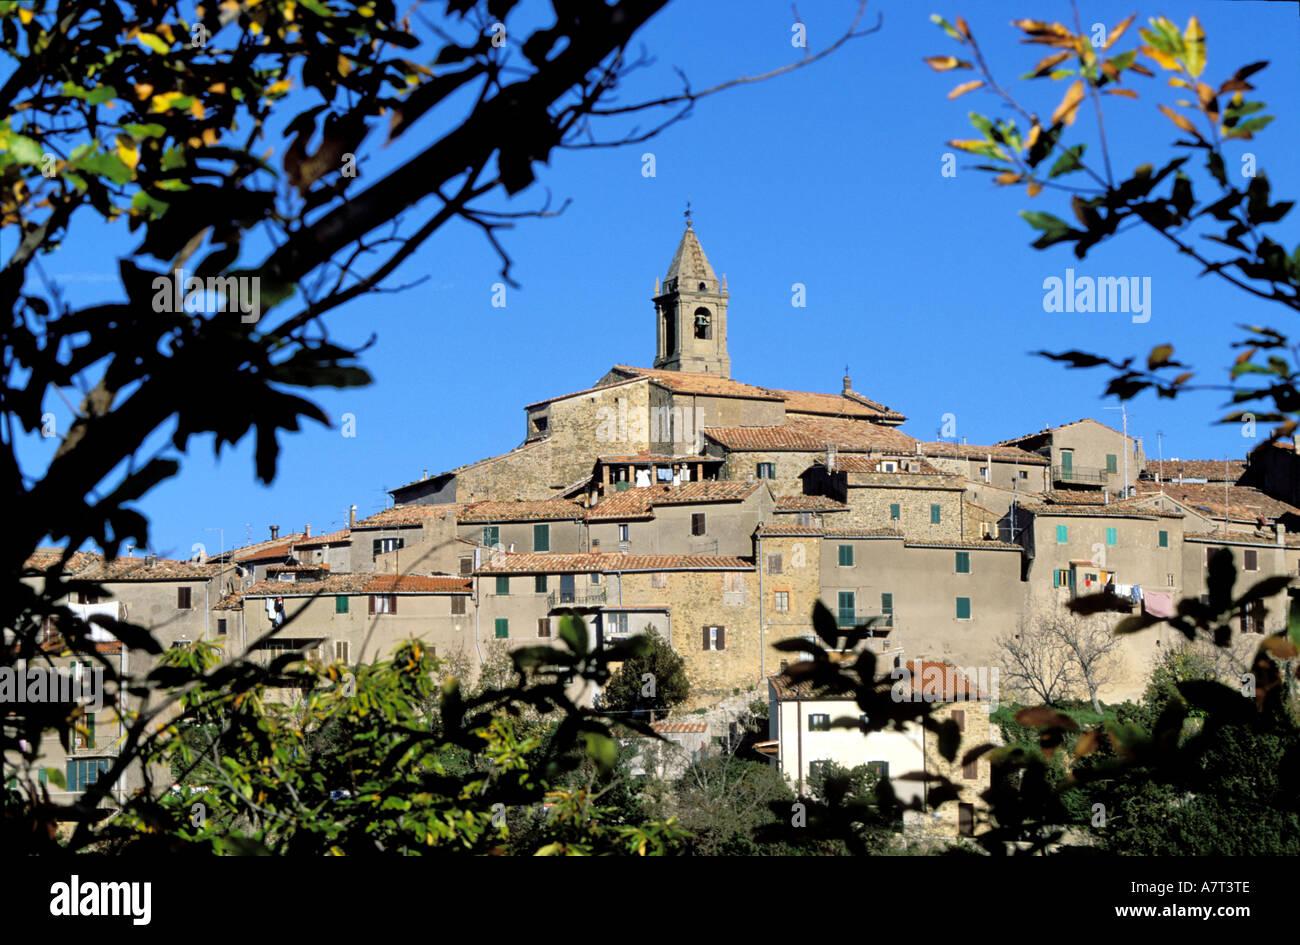 Italien, Toskana, das Dorf Monticello Amiata in der Nähe von Monte Amiata Stockfoto